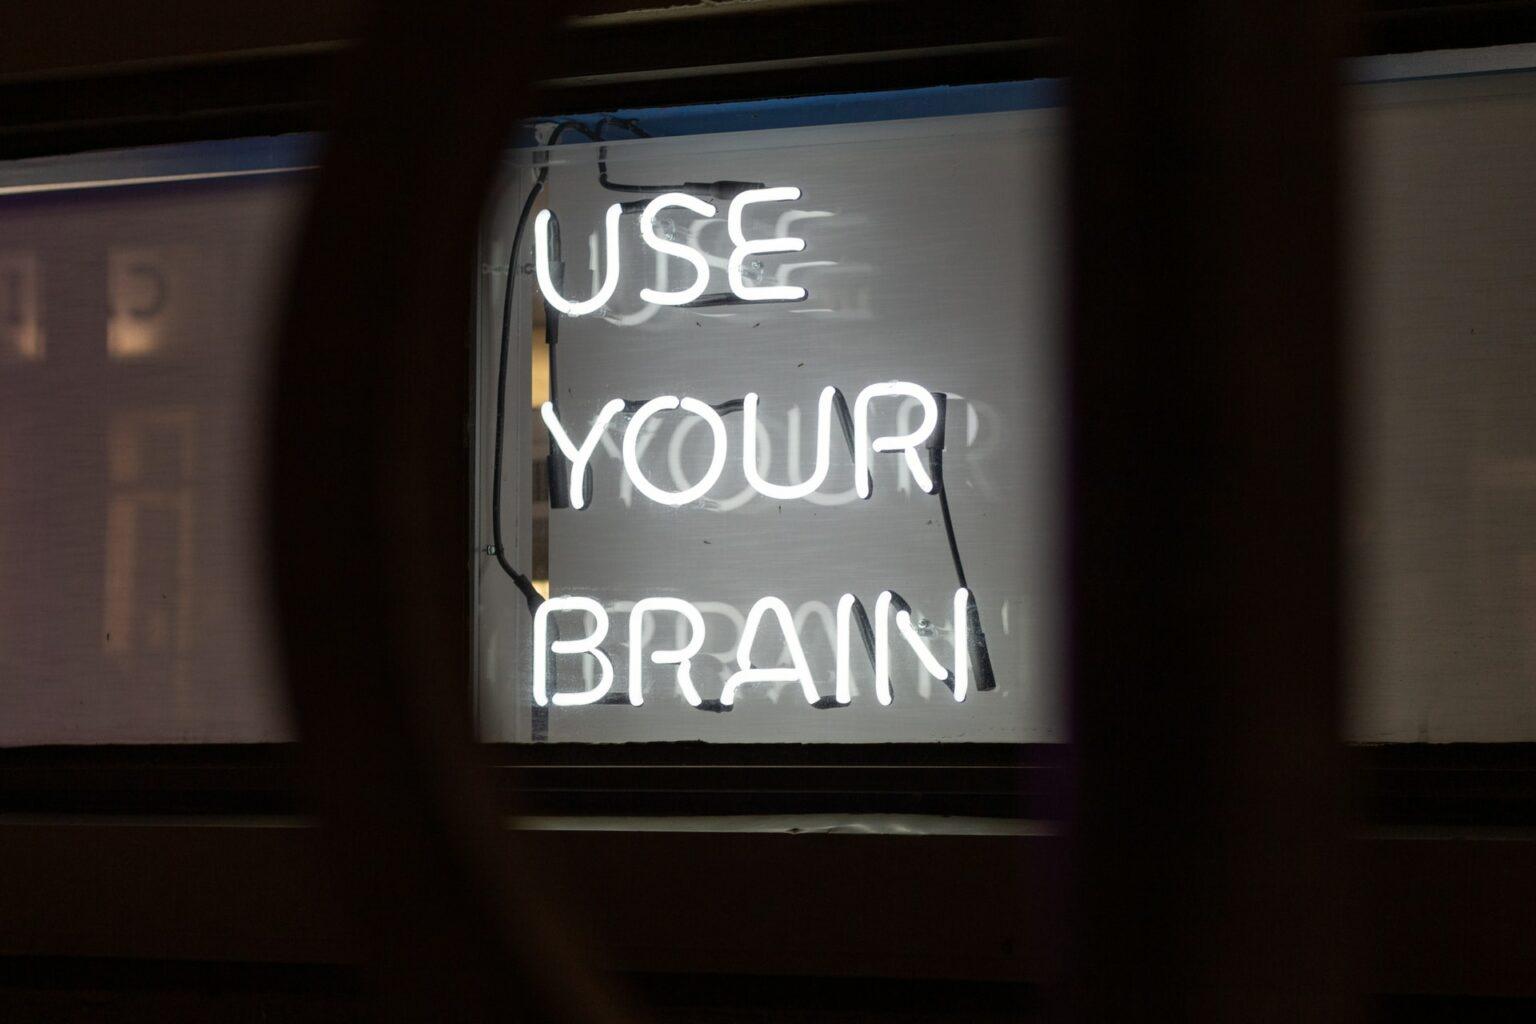 Foto zu Thema Brainstorming Tipps.